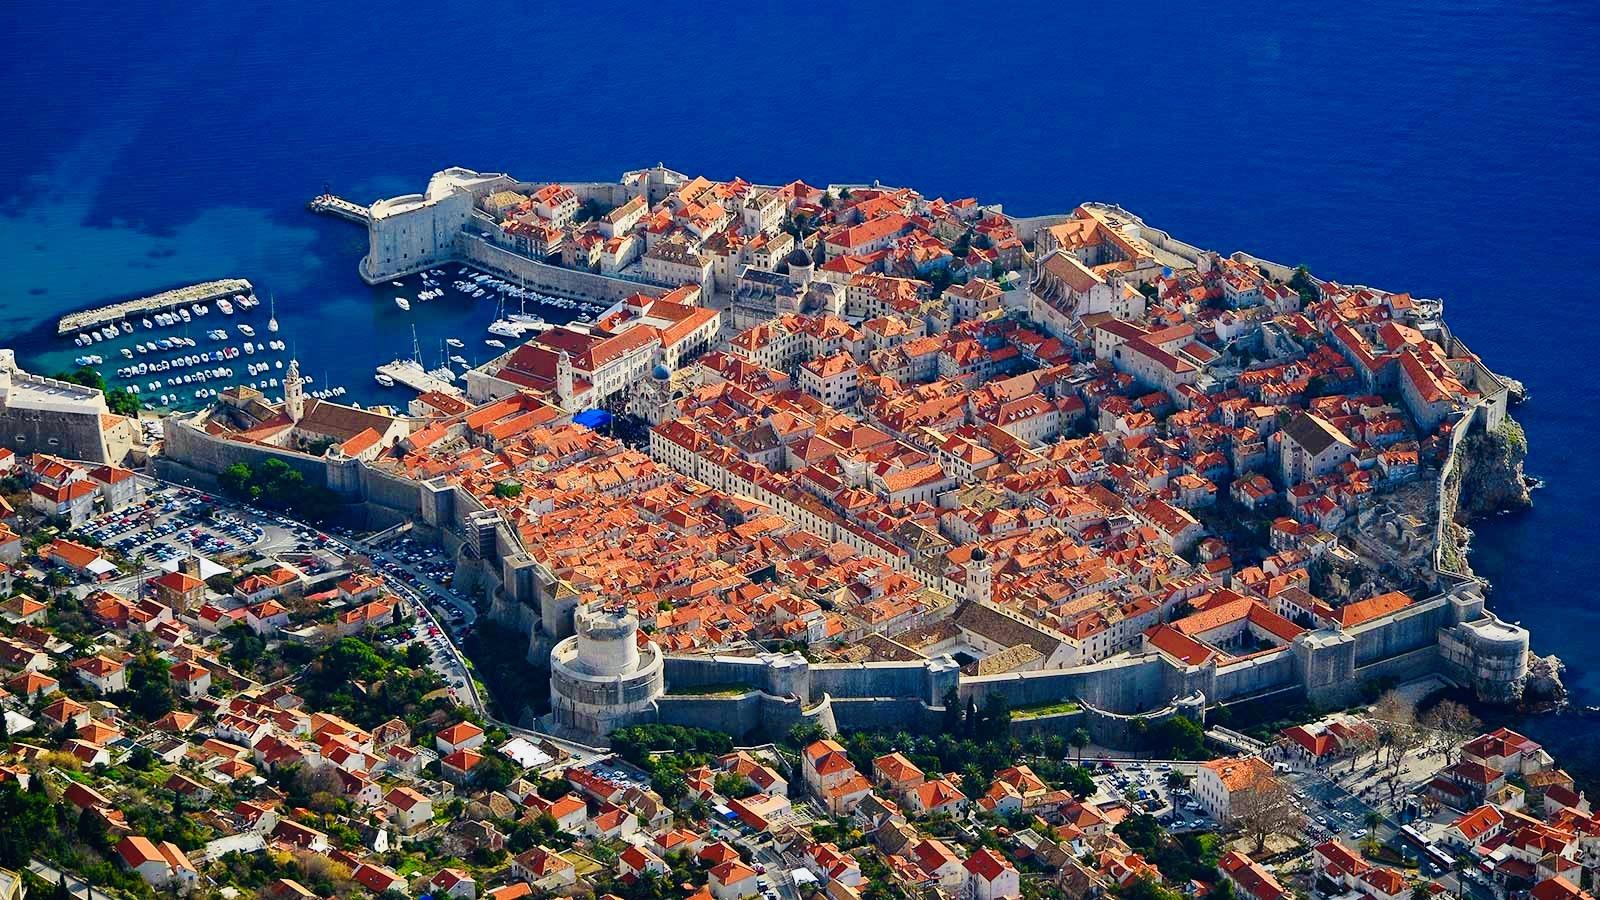 萨拉热窝(Sarajevo)-莫斯塔尔(Mostar)-杜布罗夫尼克(Dubrovnik)